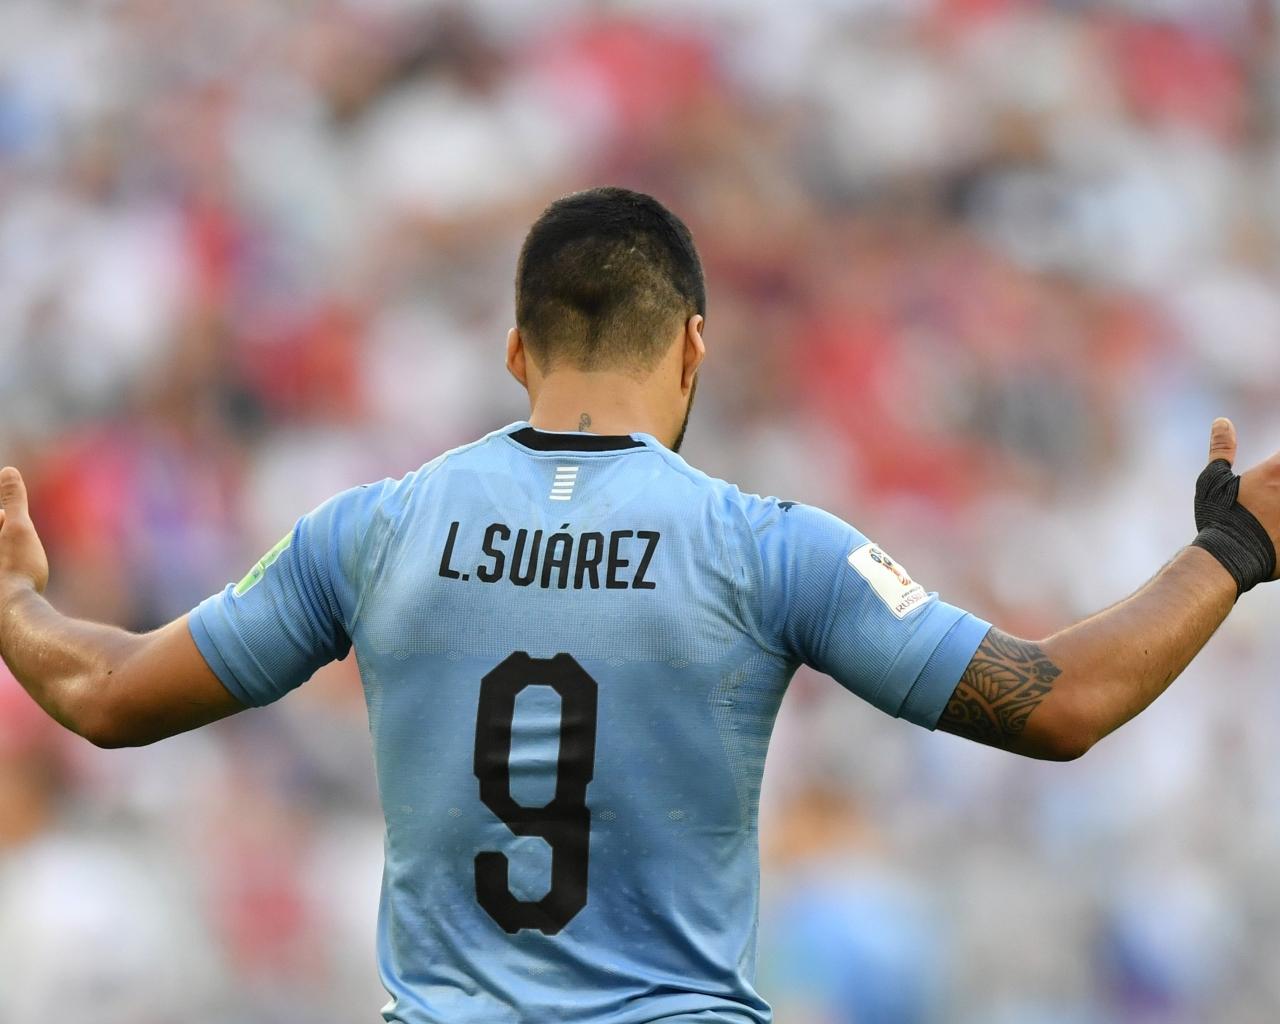 Luis Suarez - Uruguay - 1280x1024